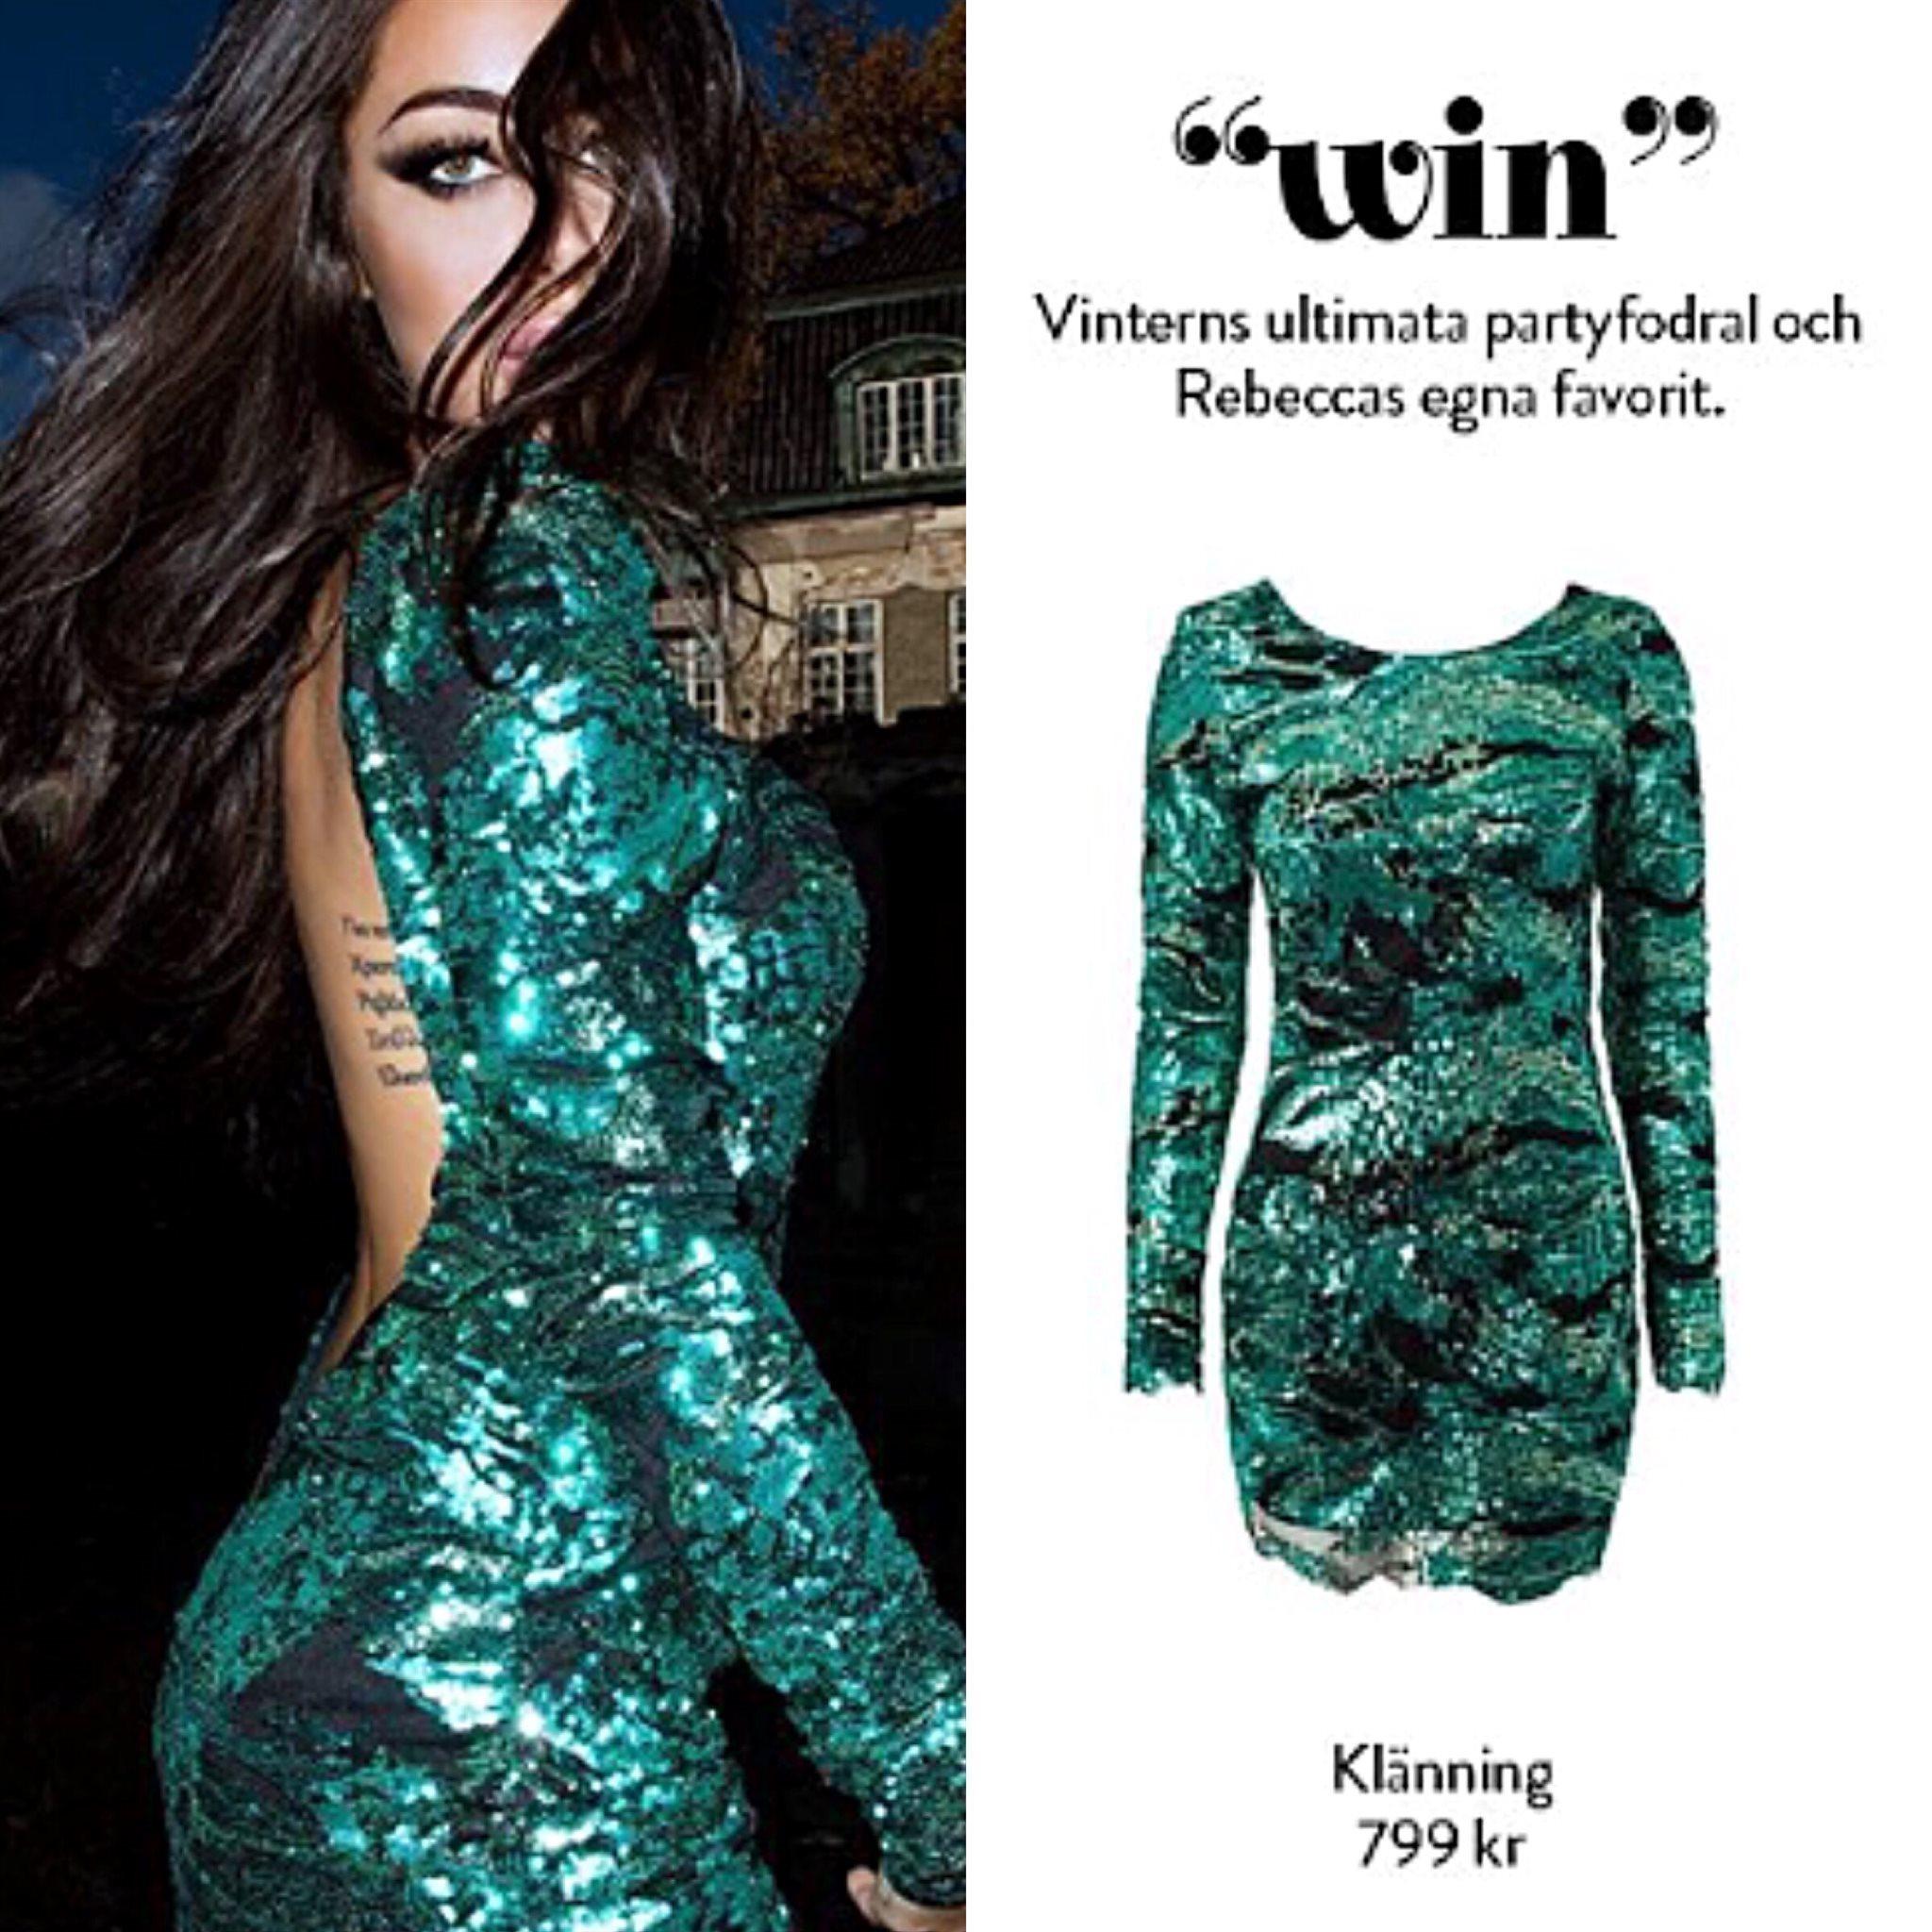 rebecca stella glitter klänning